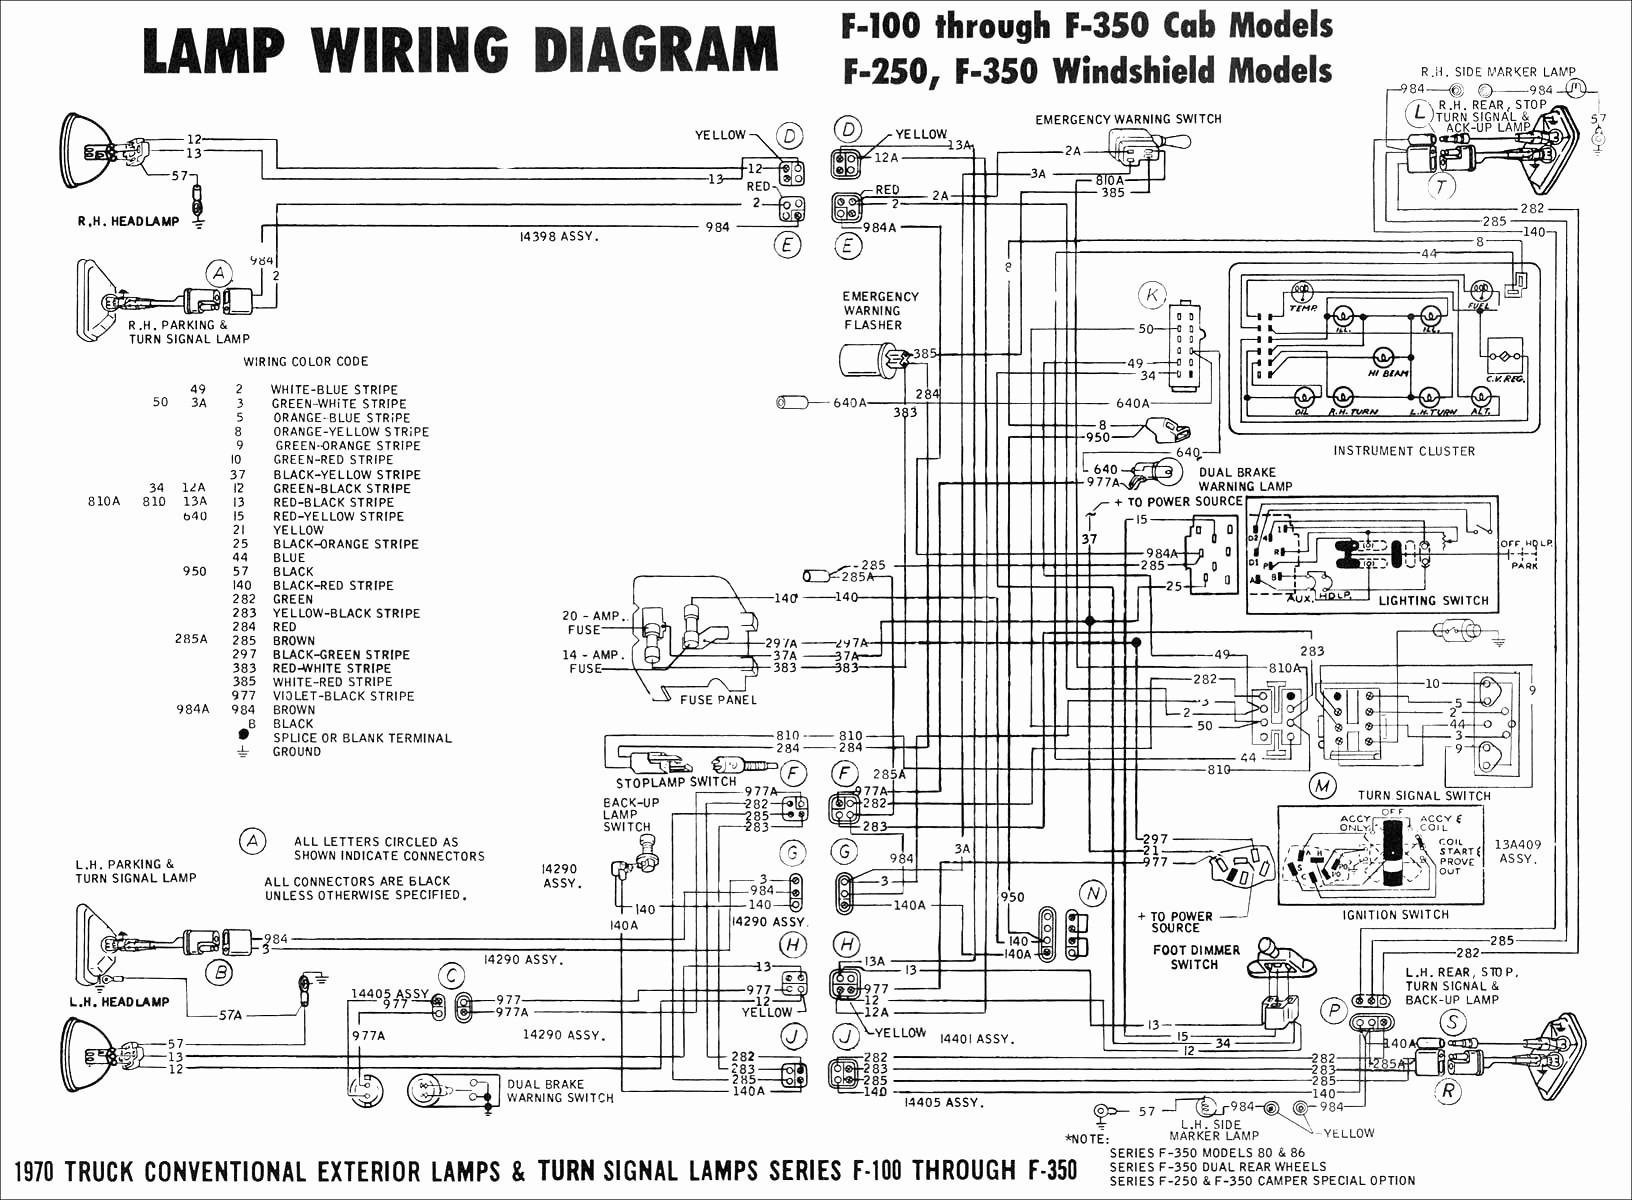 2003 ford Explorer Engine Diagram Electric Schematic Wiring Diagram 2000 ford Explorer Suv Of 2003 ford Explorer Engine Diagram